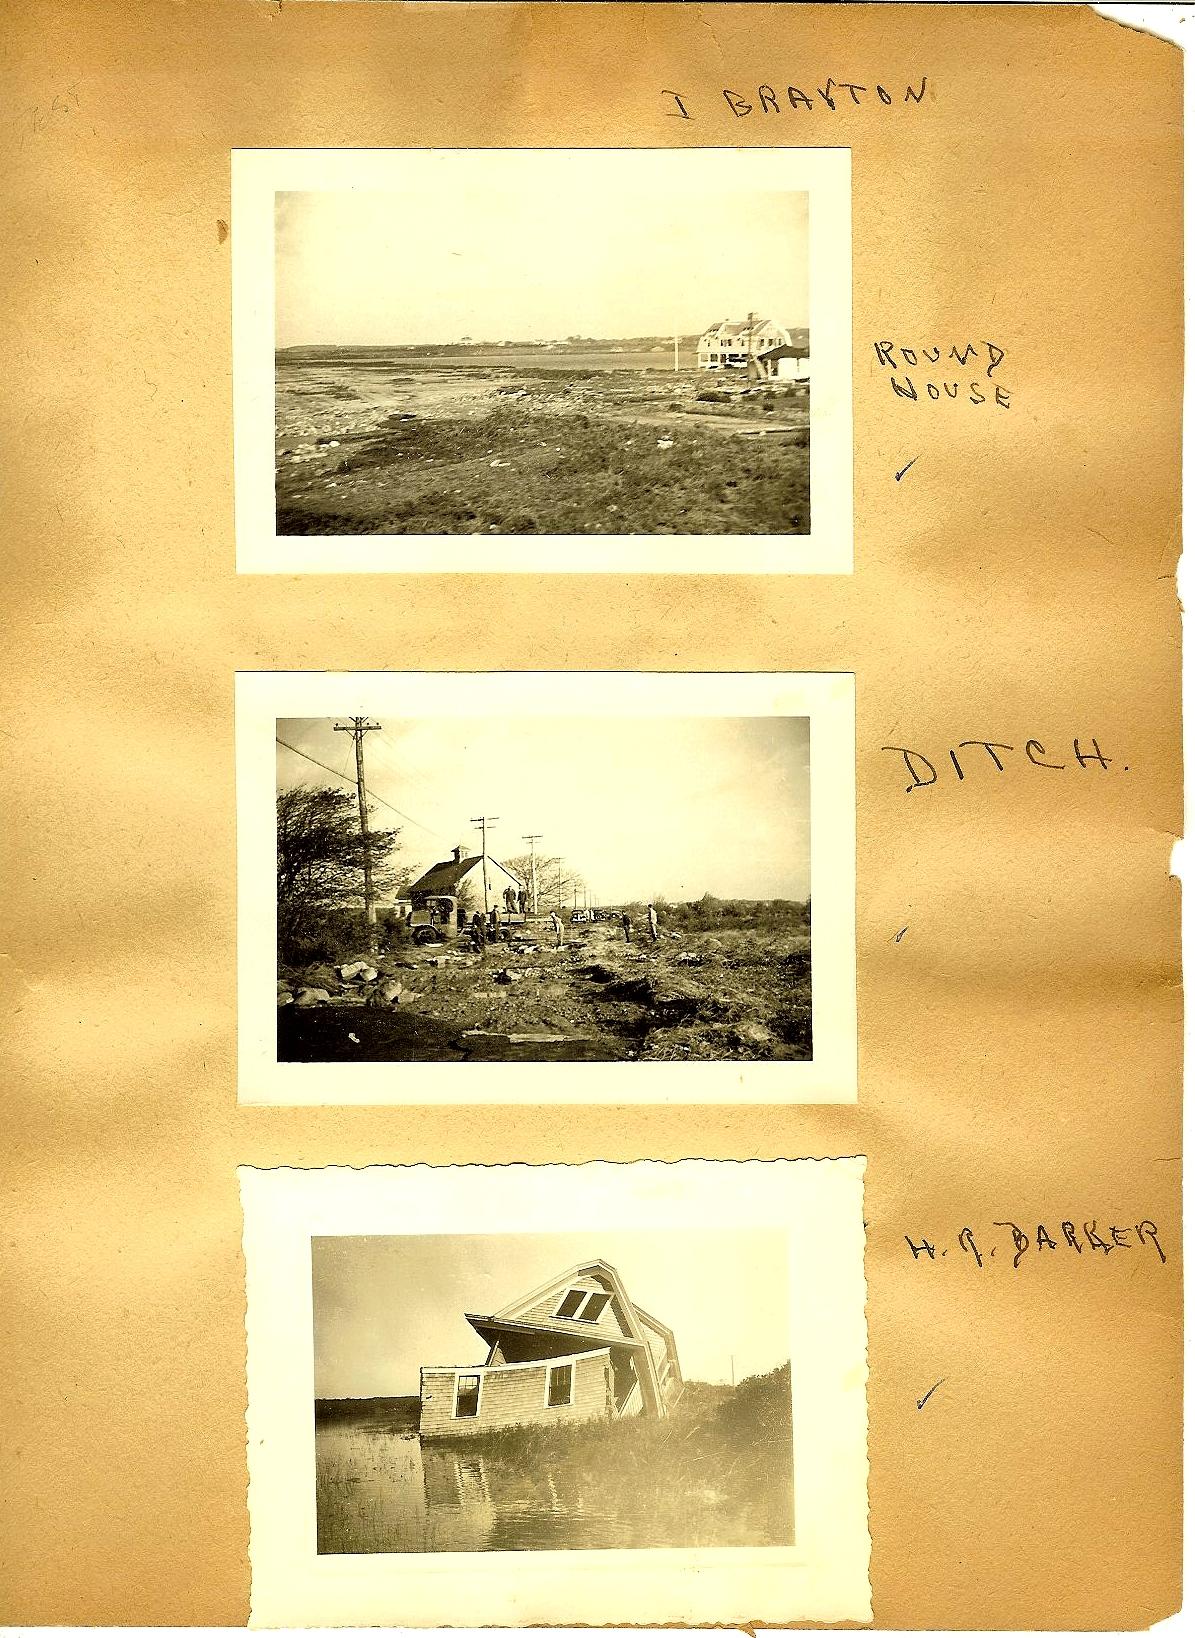 The 1938 Hurricane photos p25